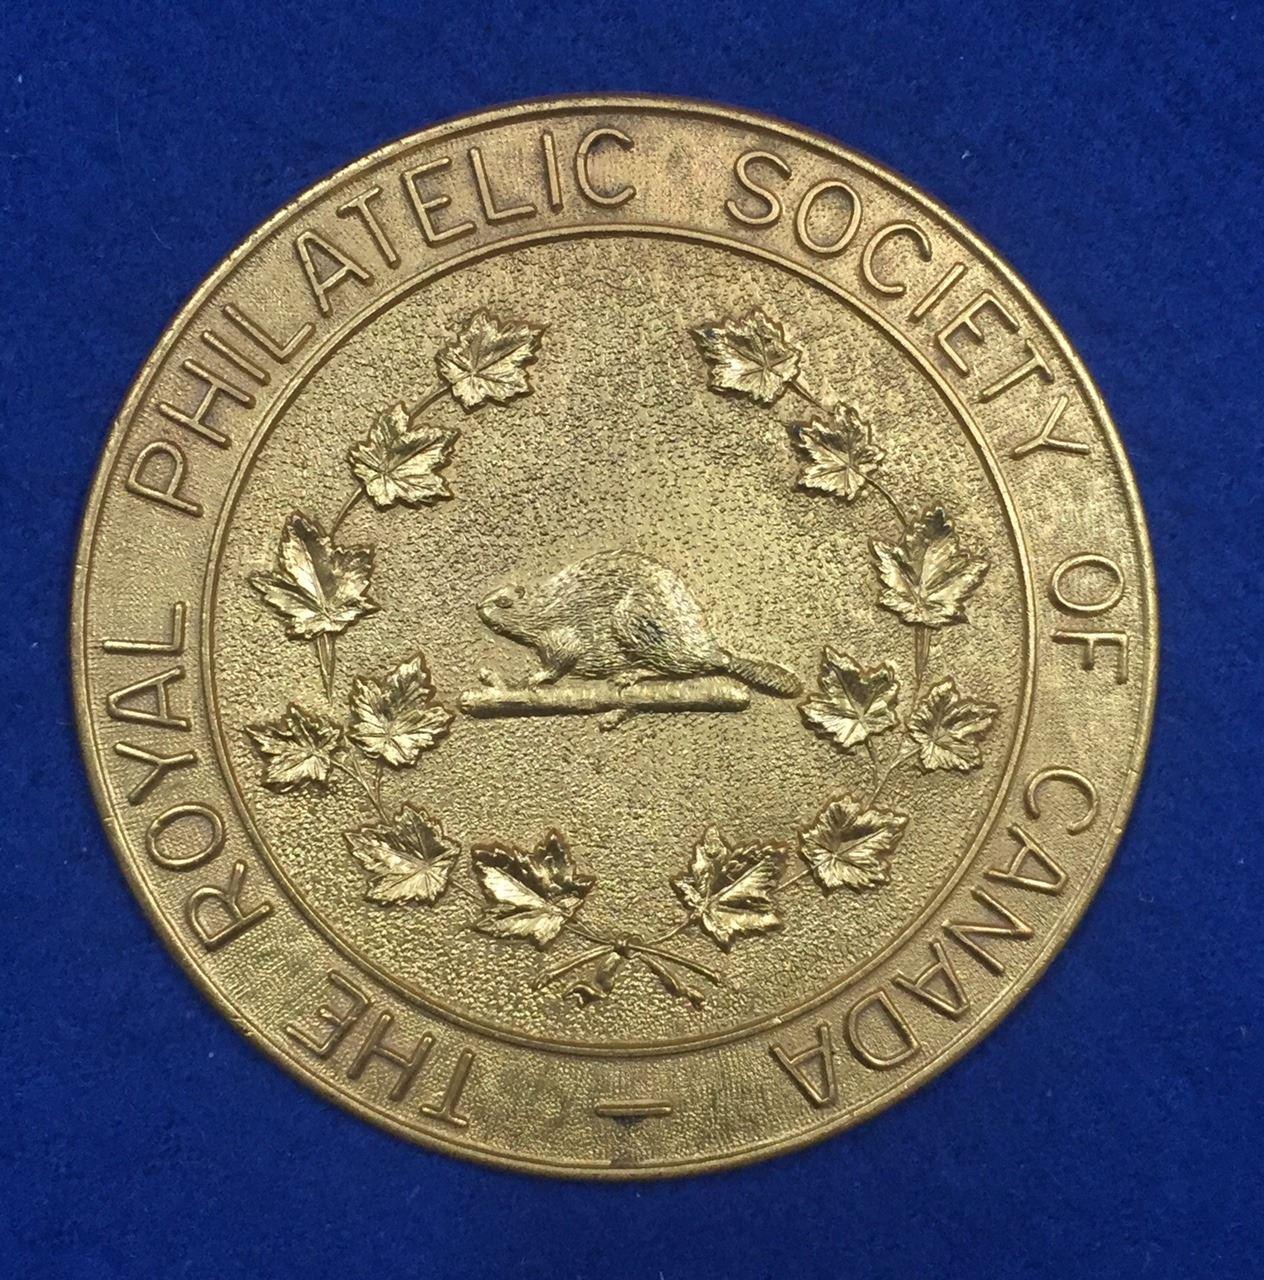 The Royal Philatelic Society of Canada Medal